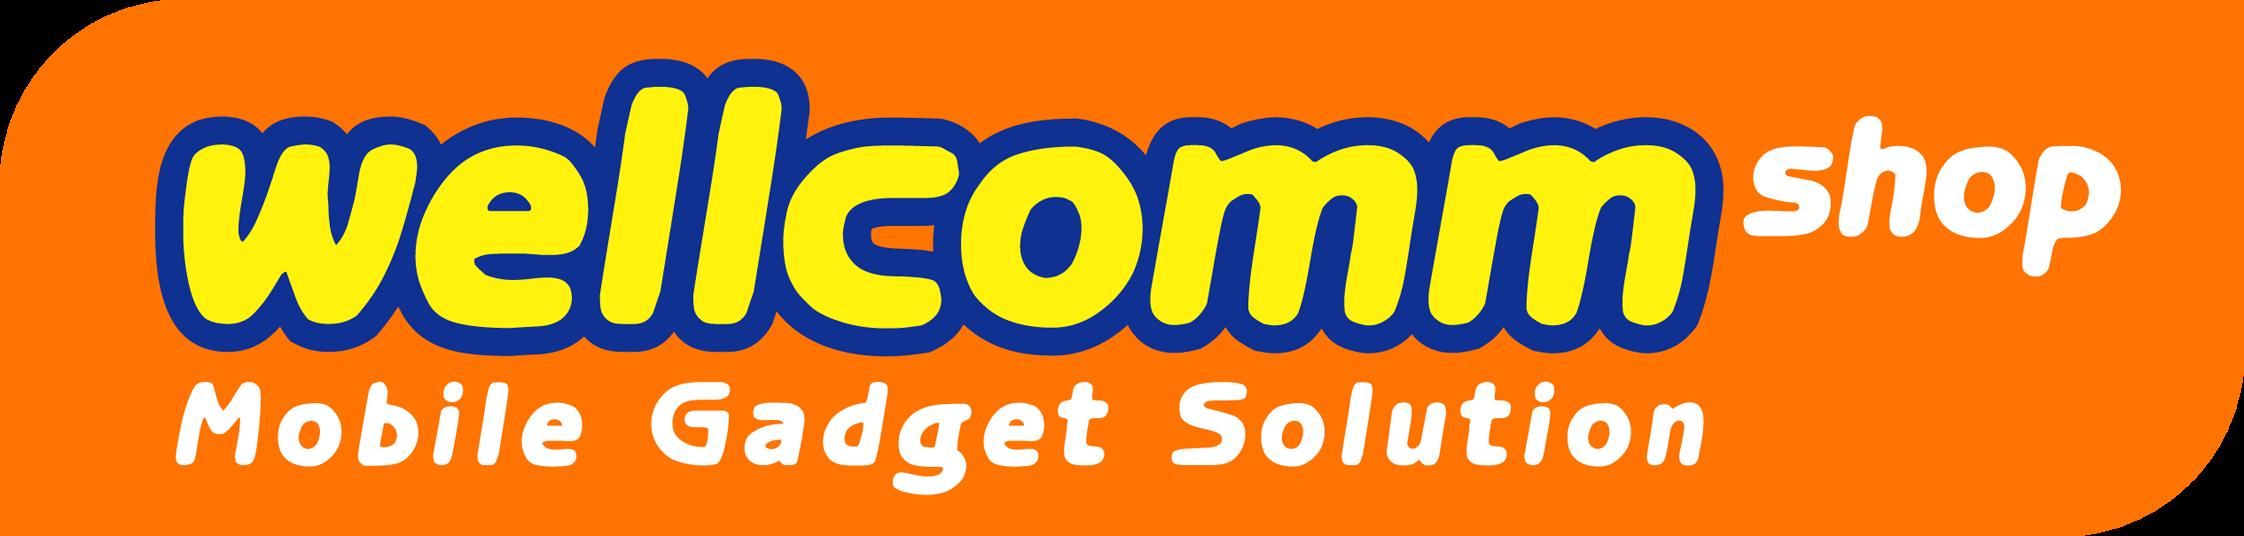 logo wellcomm shop